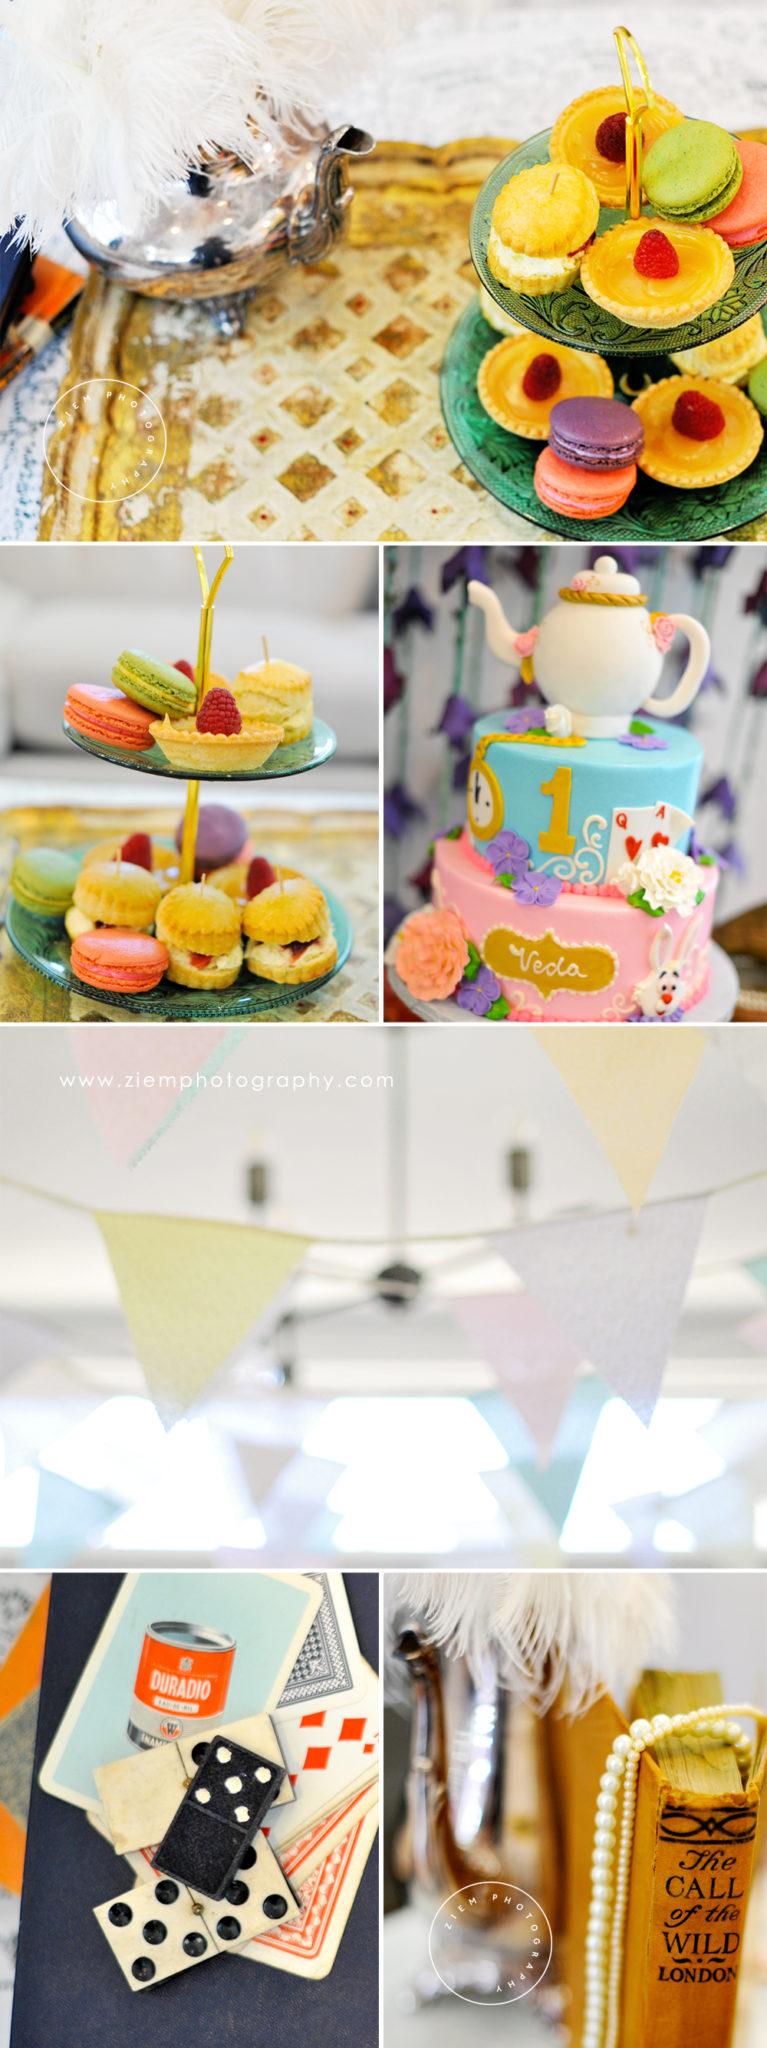 princess tea party austin tx ziem photography